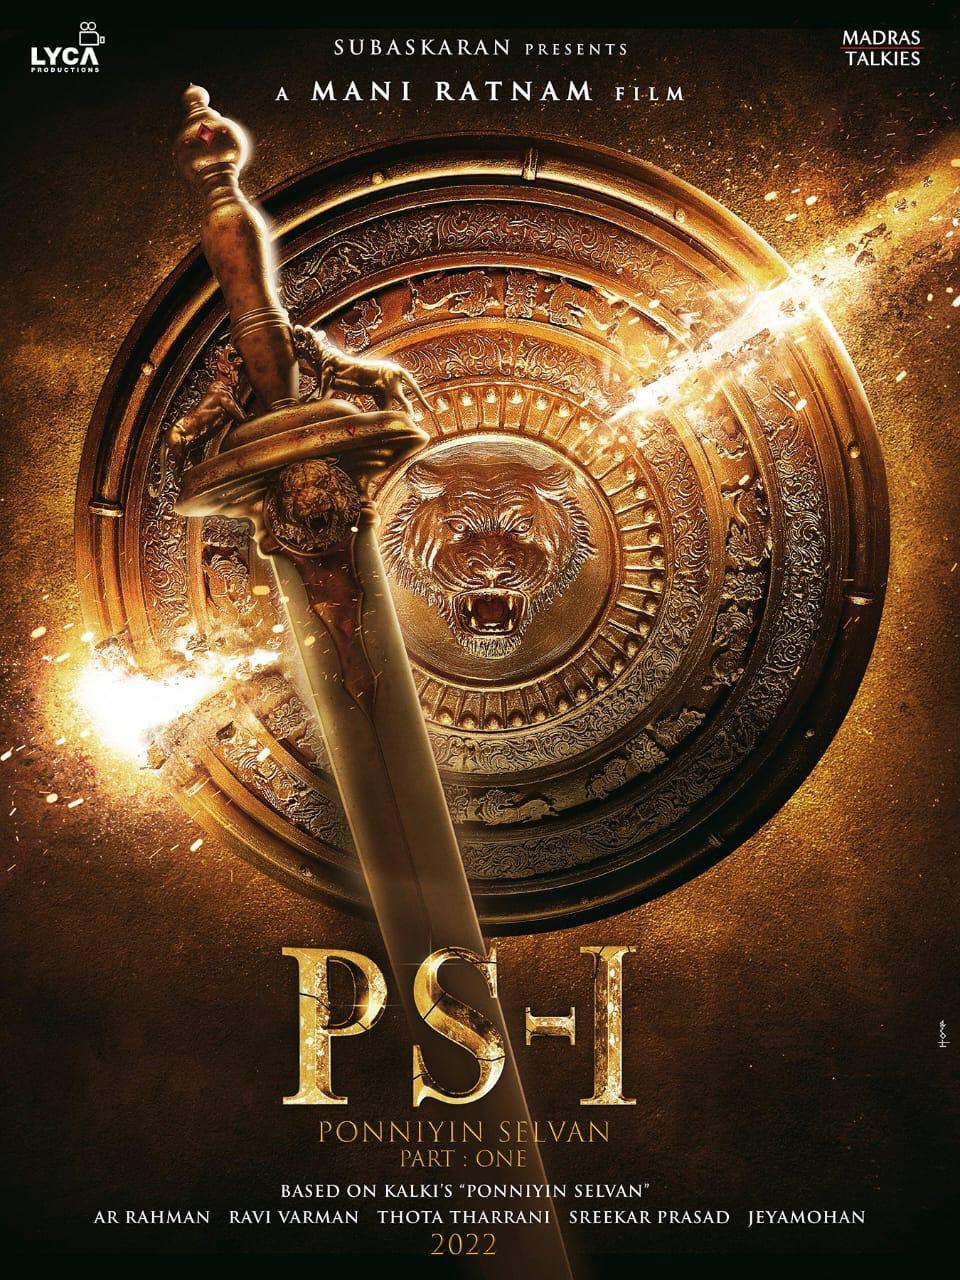 Lyca Productions Subaskaran Mani Ratnam Ponniyin Selvan-I movie release in 2022